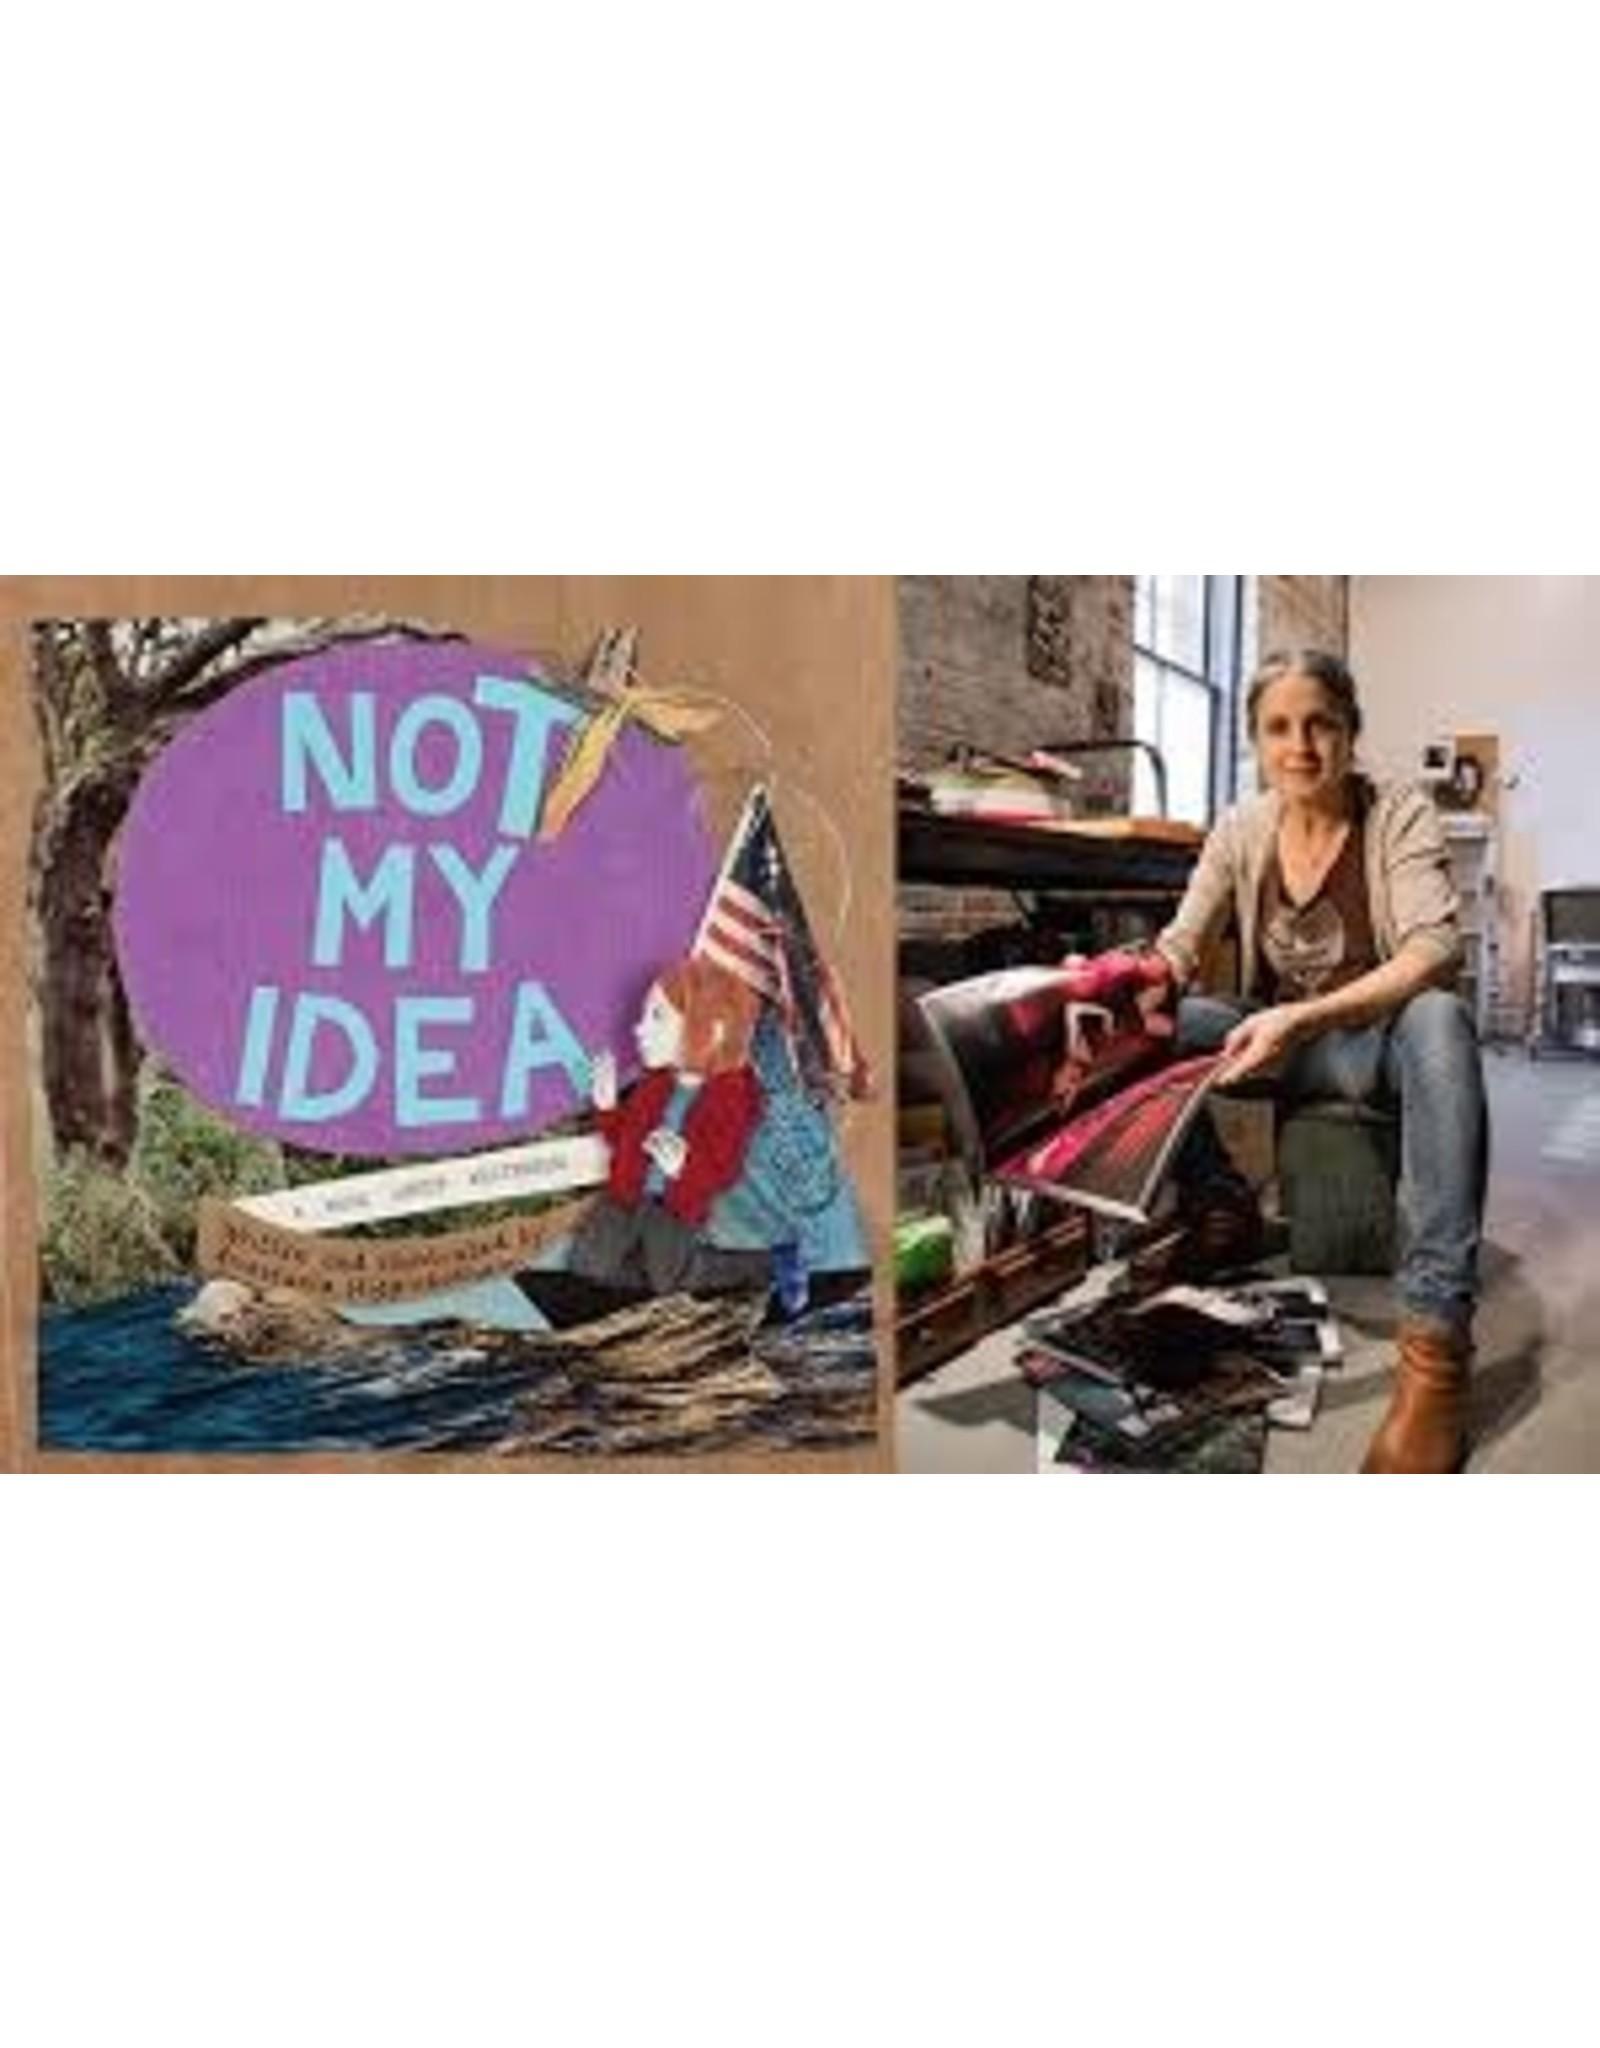 Books Not My Idea by Anastasia Higginbotham